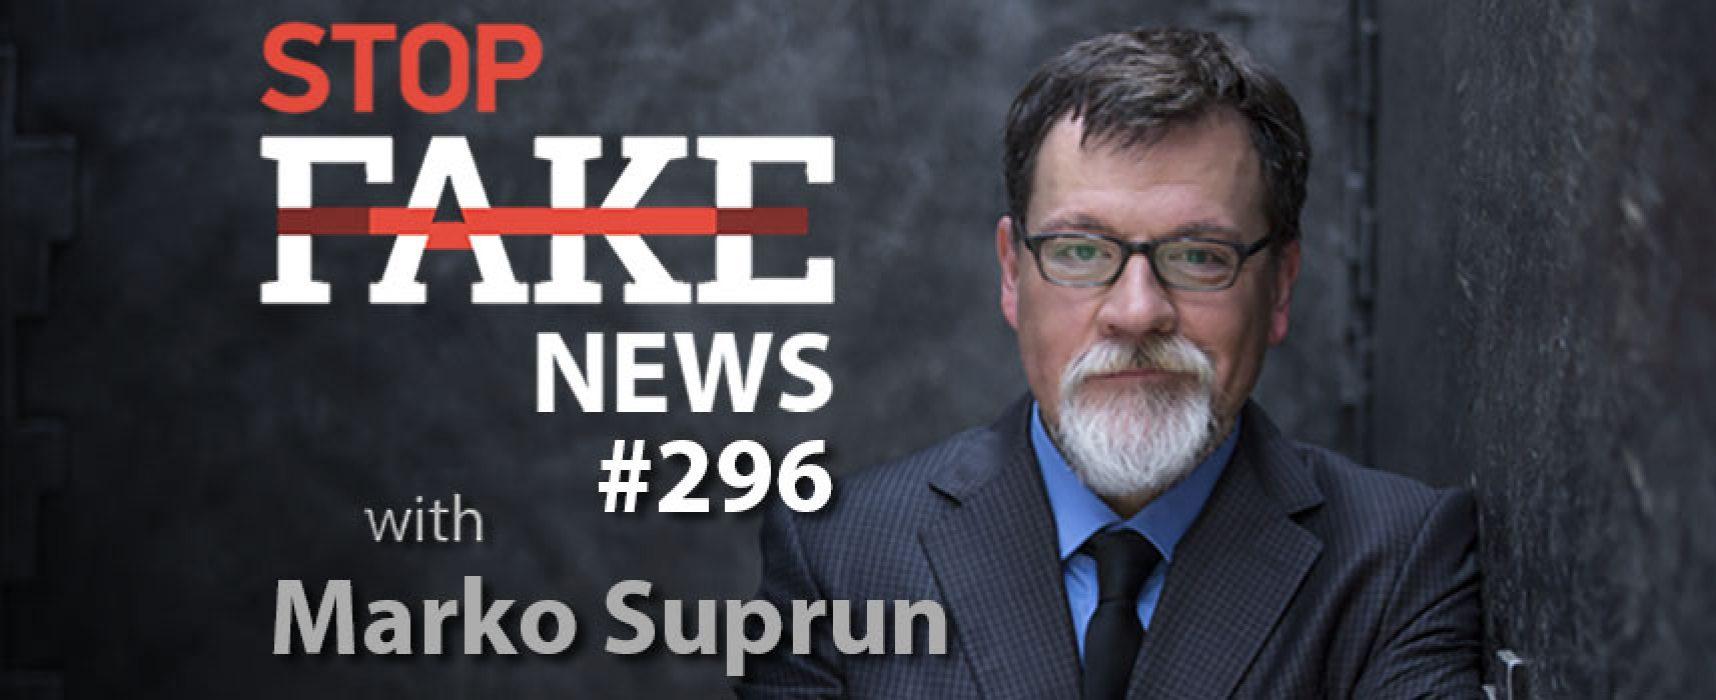 Ukraine Wants to Return to Russia: StopFakeNews with Marko Suprun (No. 296)